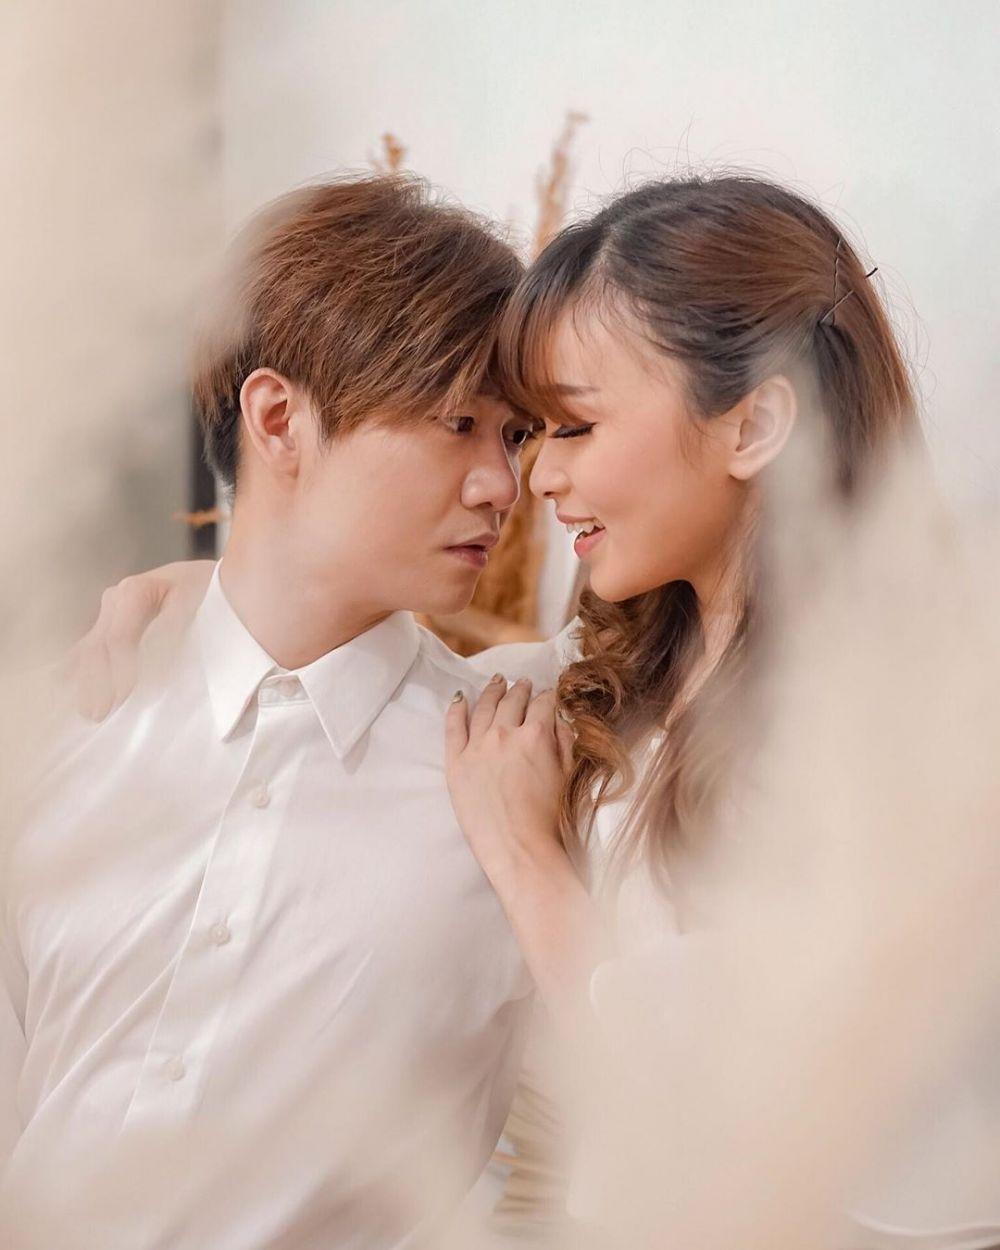 Bak Masih Pacaran, 9 Potret Mesra Angel Eks Cherrybelle bersama Suami